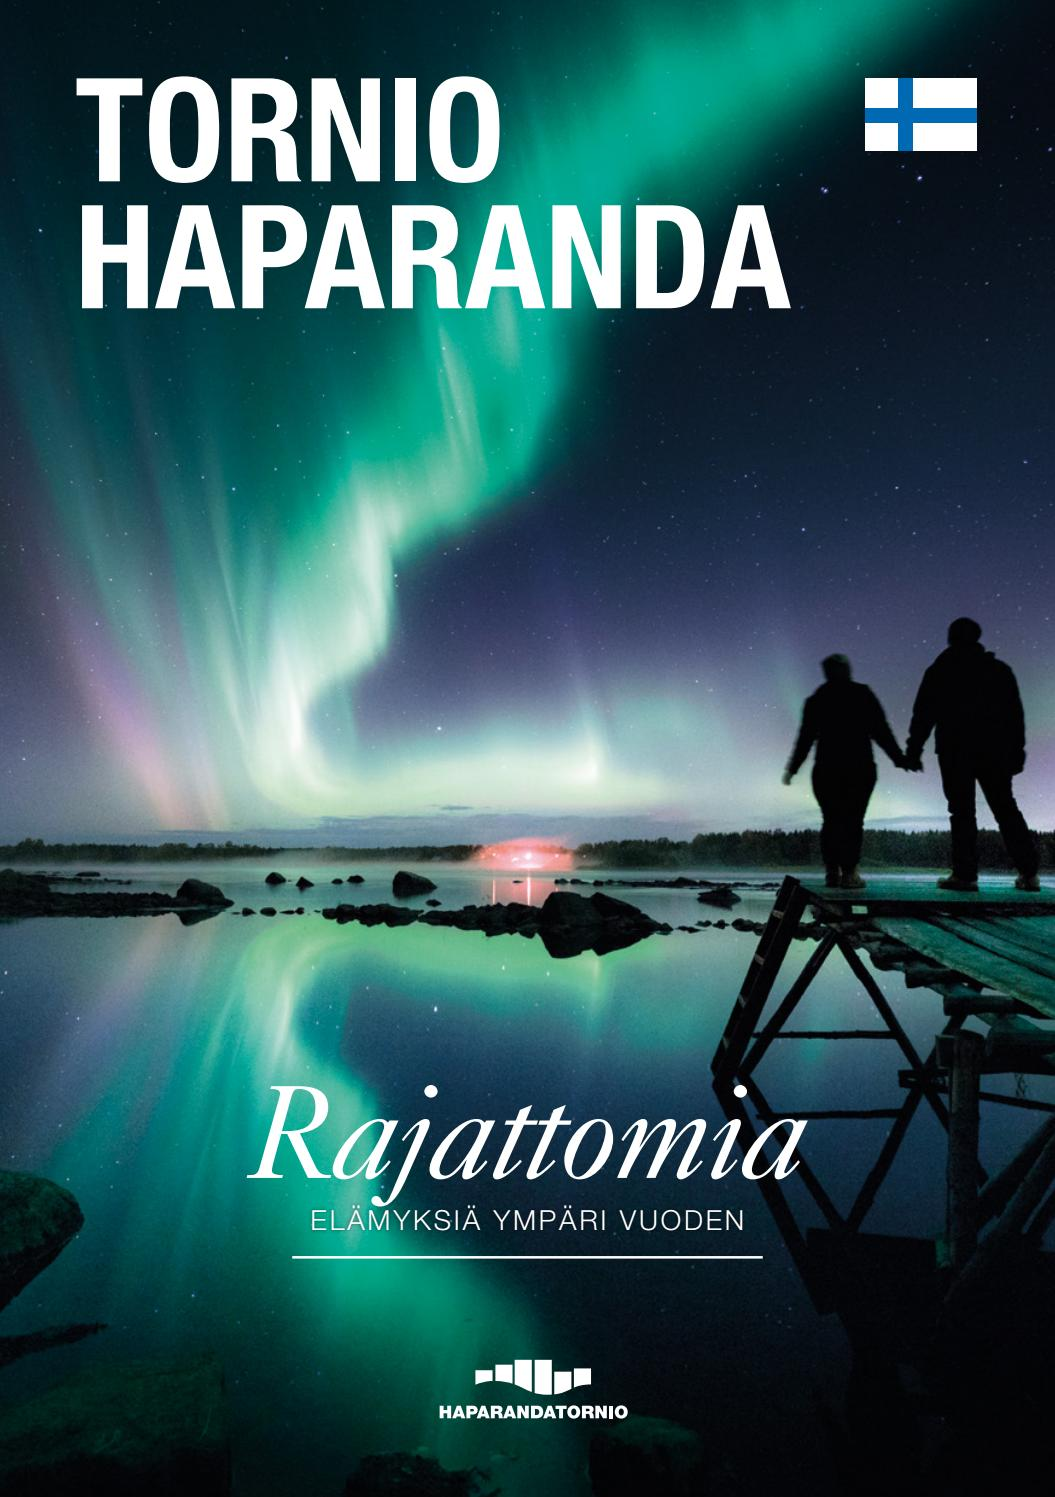 Torniohaparanda Esite 2019 By Haparanda Tornio Issuu